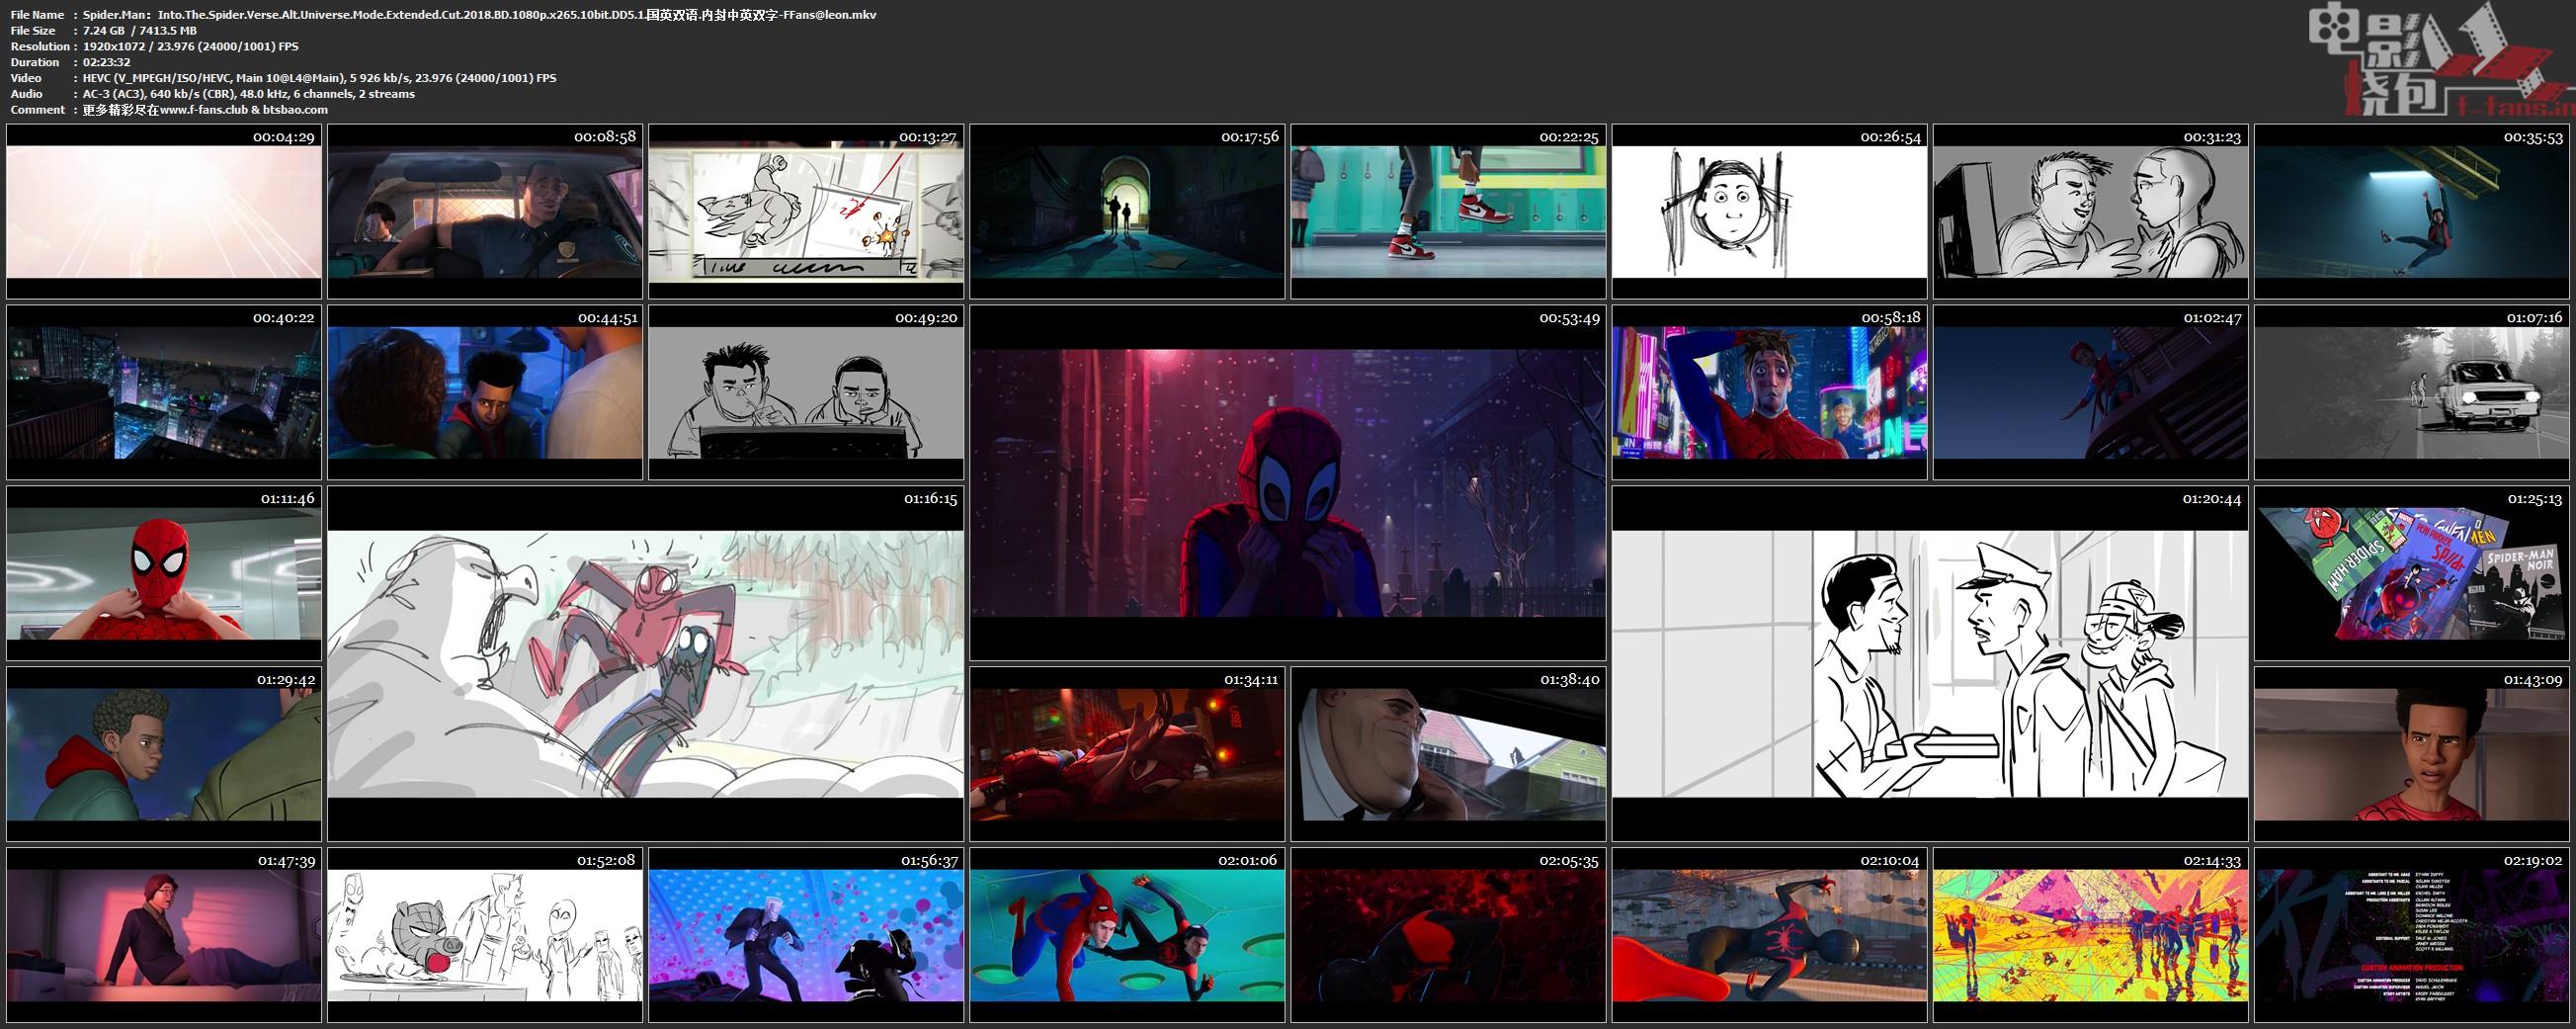 Spider.ManInto.The.Spider.Verse.Alt.Universe.Mode.Extended.Cut.2018.BD.1080p.x265.10bit.DD5.1..-FFansleon.mkv.jpg